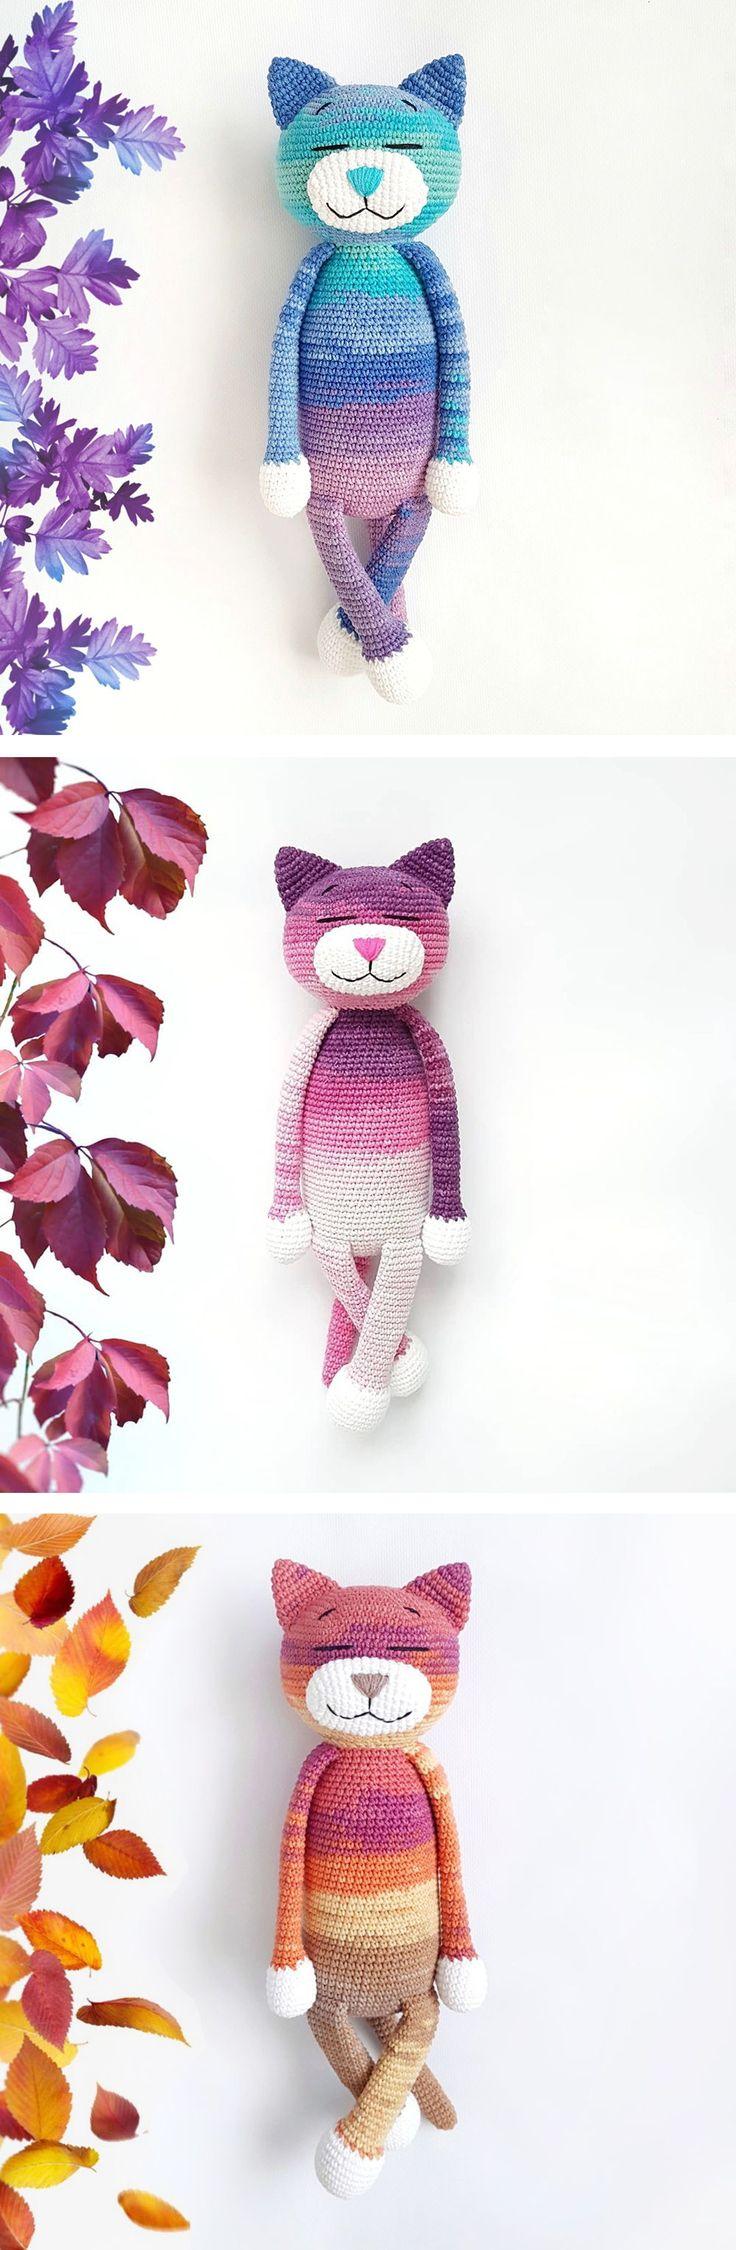 Cat crochet pattern by Amigurumi Today #free #crochet #amigurumi #pattern #amigu...